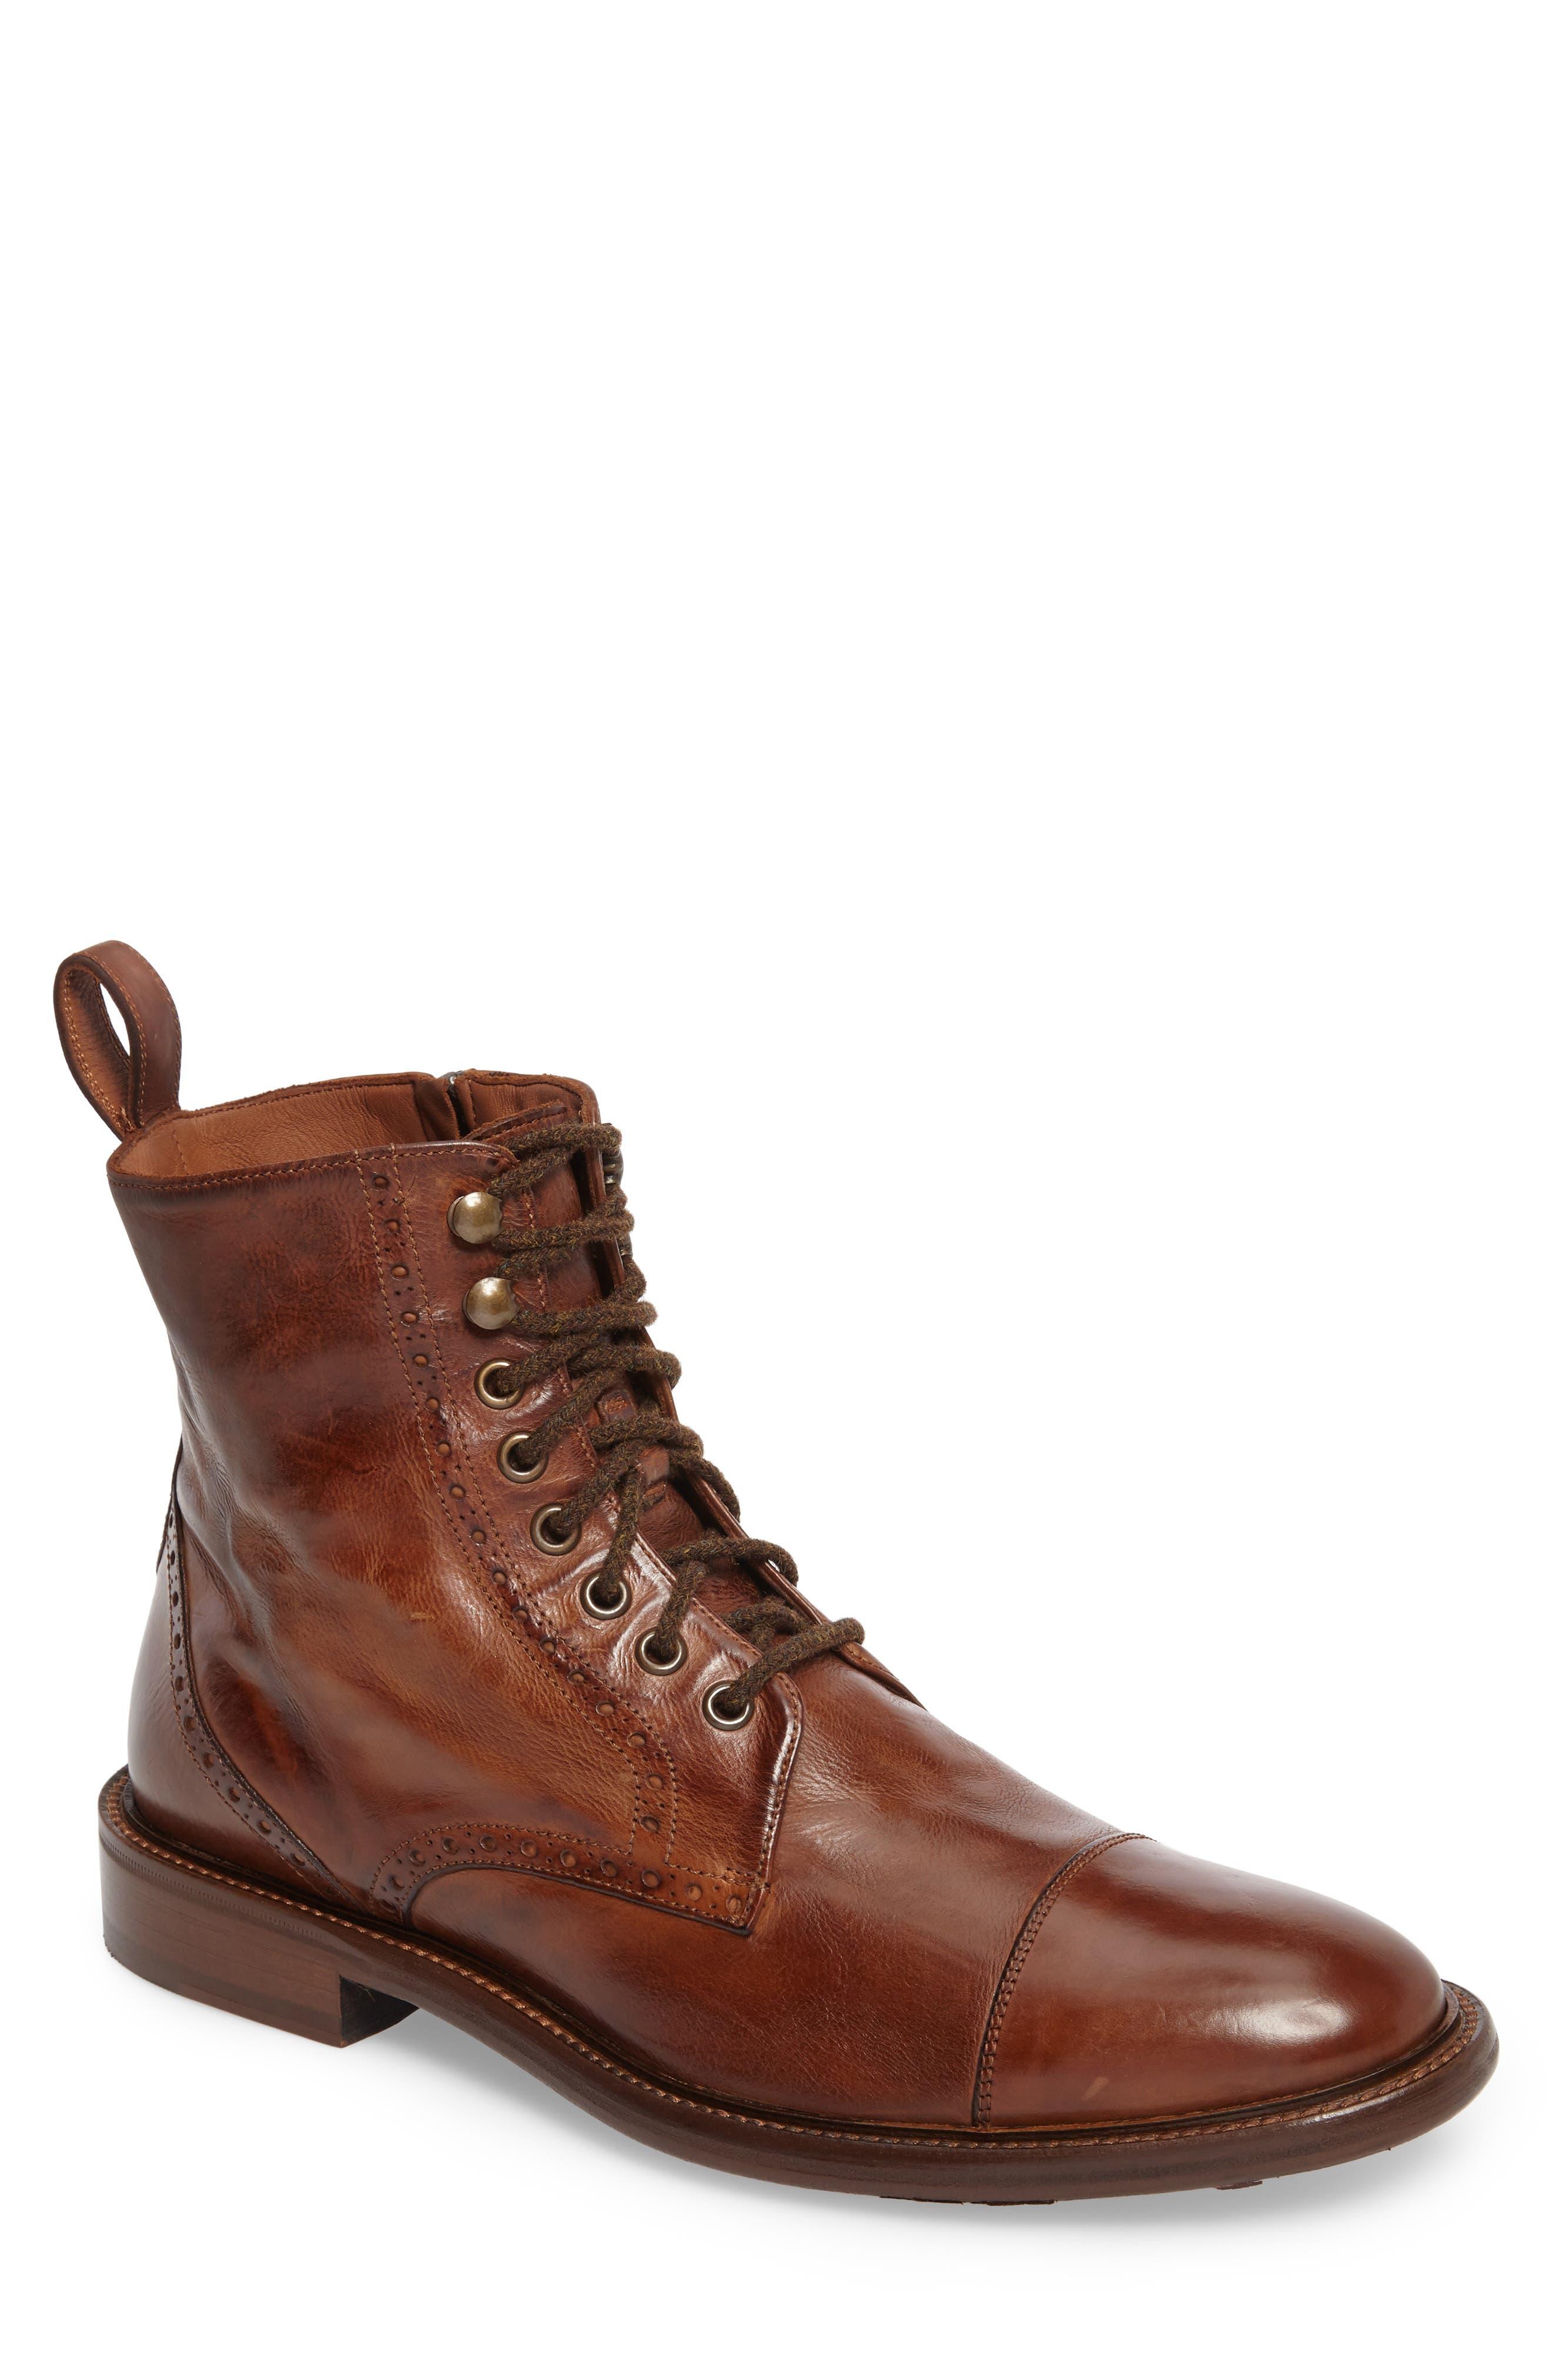 Bryson Cap Toe Boot,                             Main thumbnail 1, color,                             Mahogany Leather